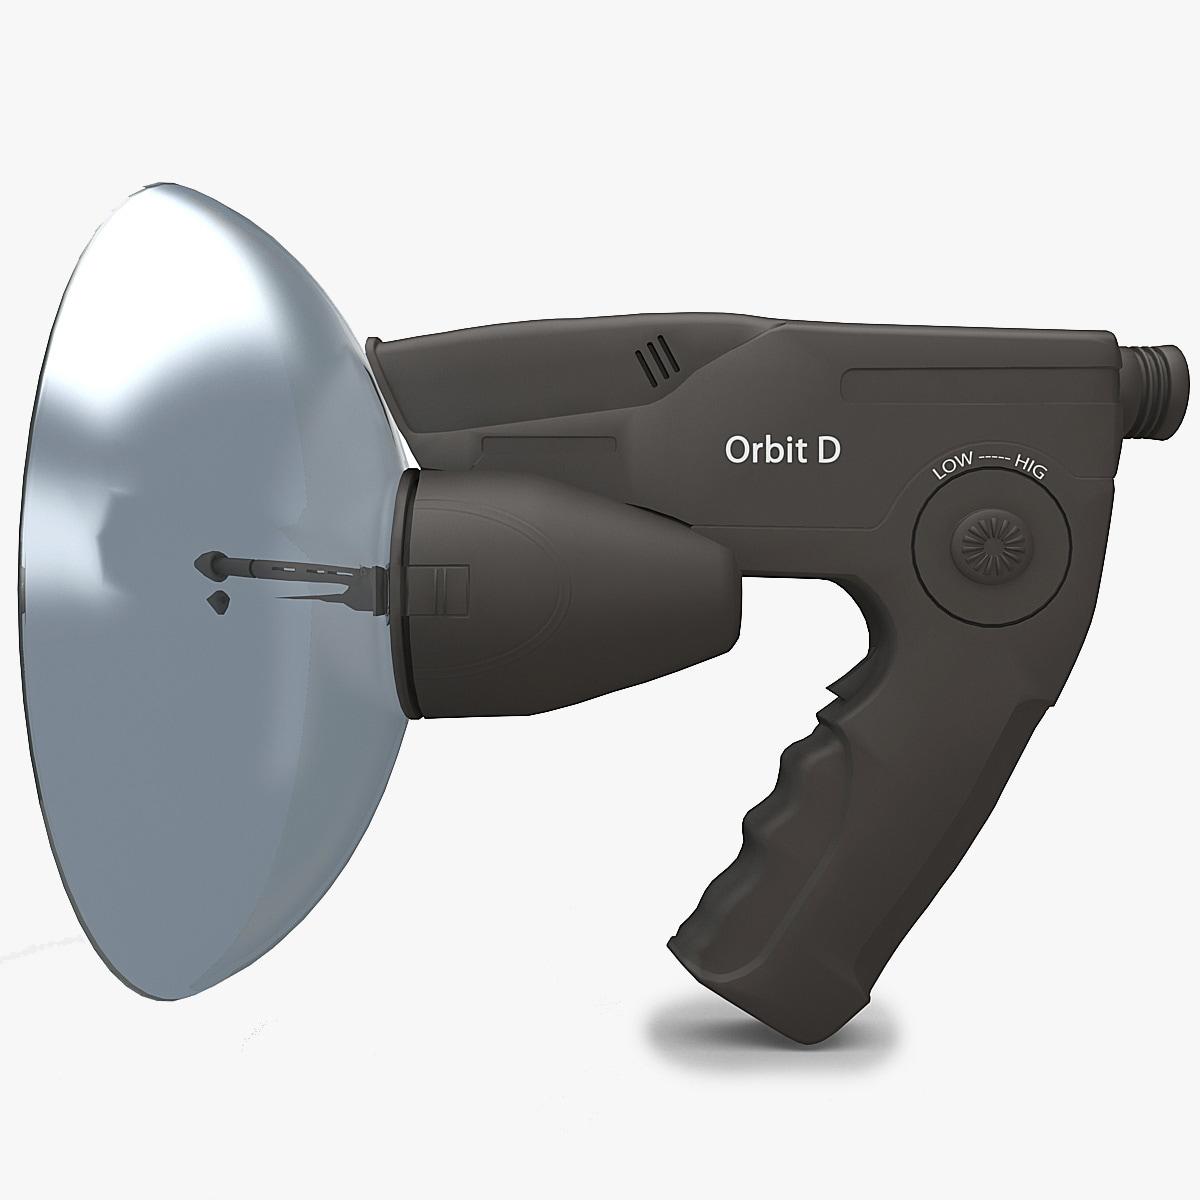 Orbitor_Electronic_Listening_Device_000.jpg